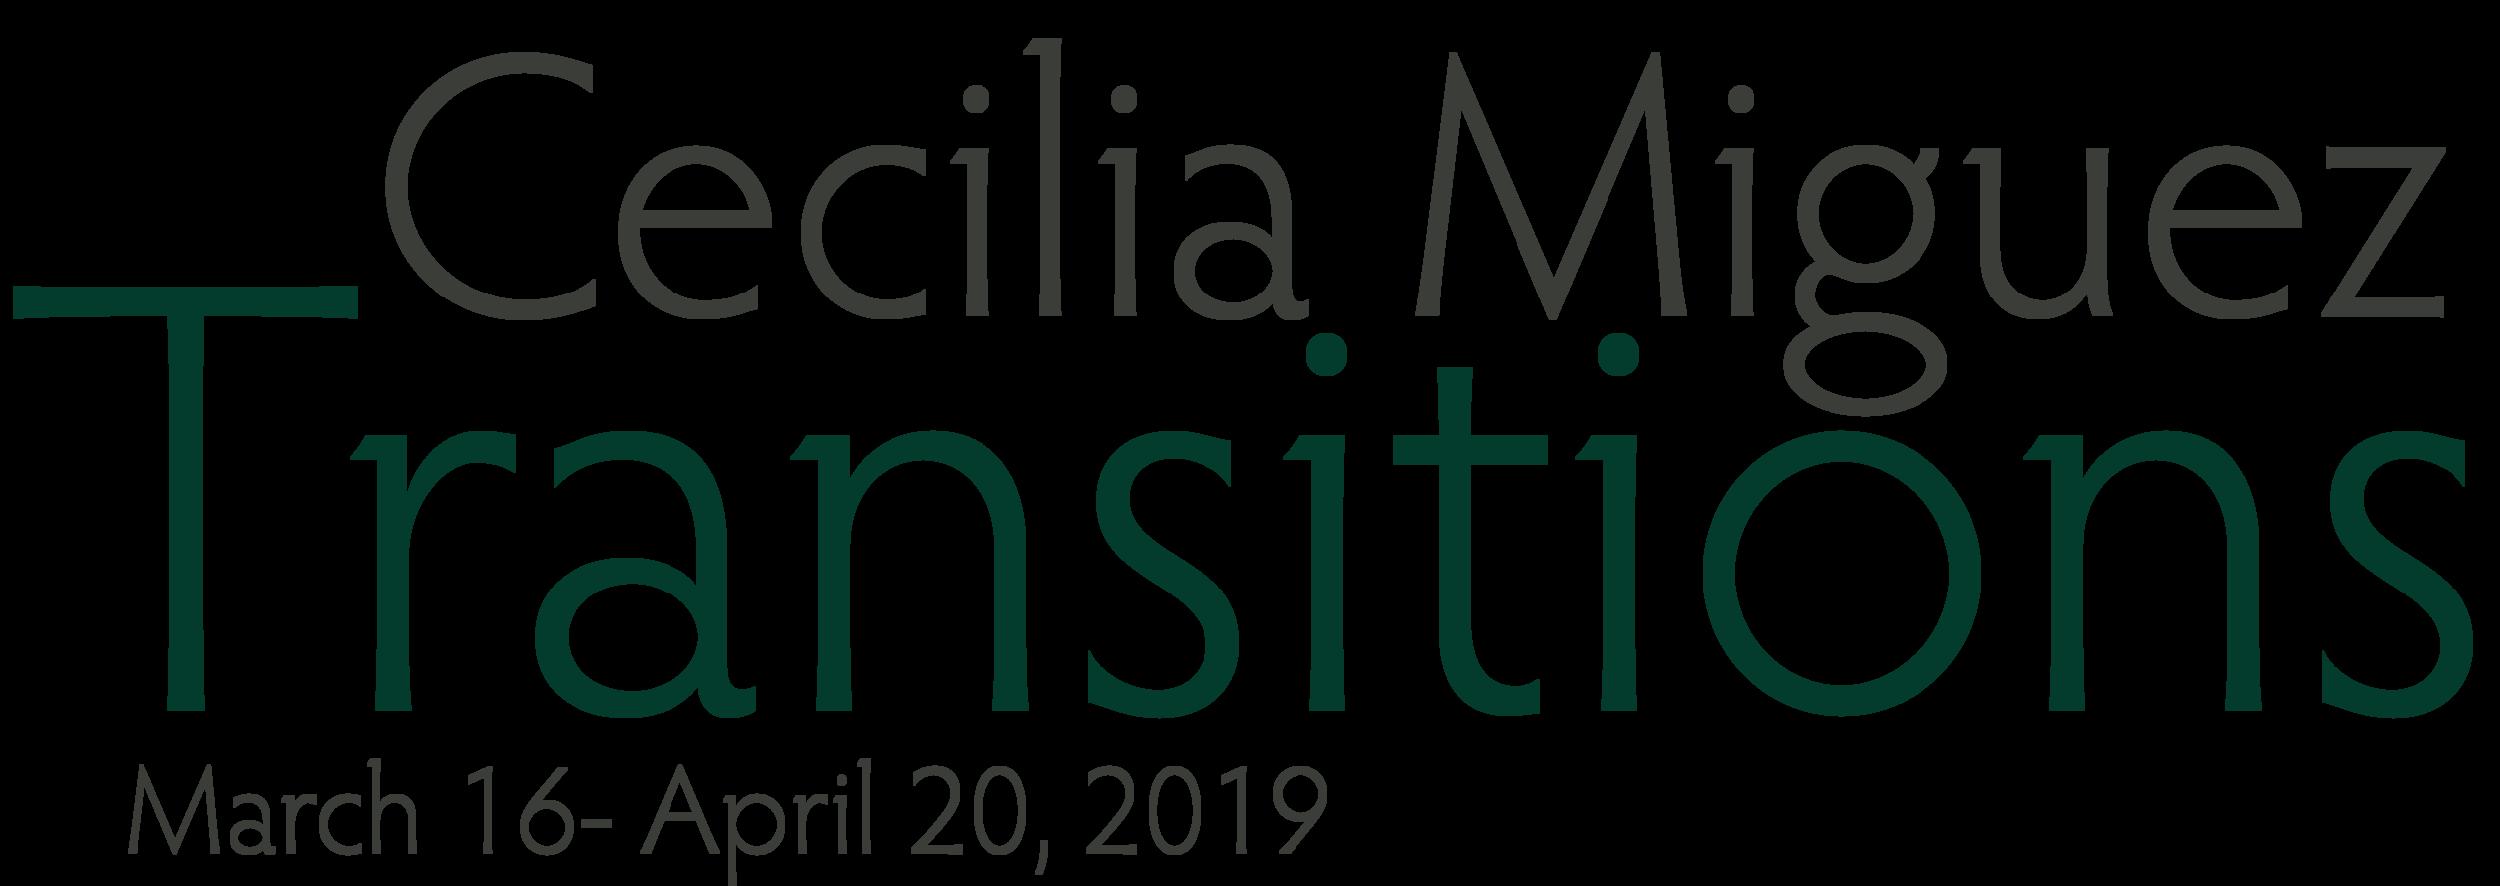 Cecilia Miguez Banner (date).png